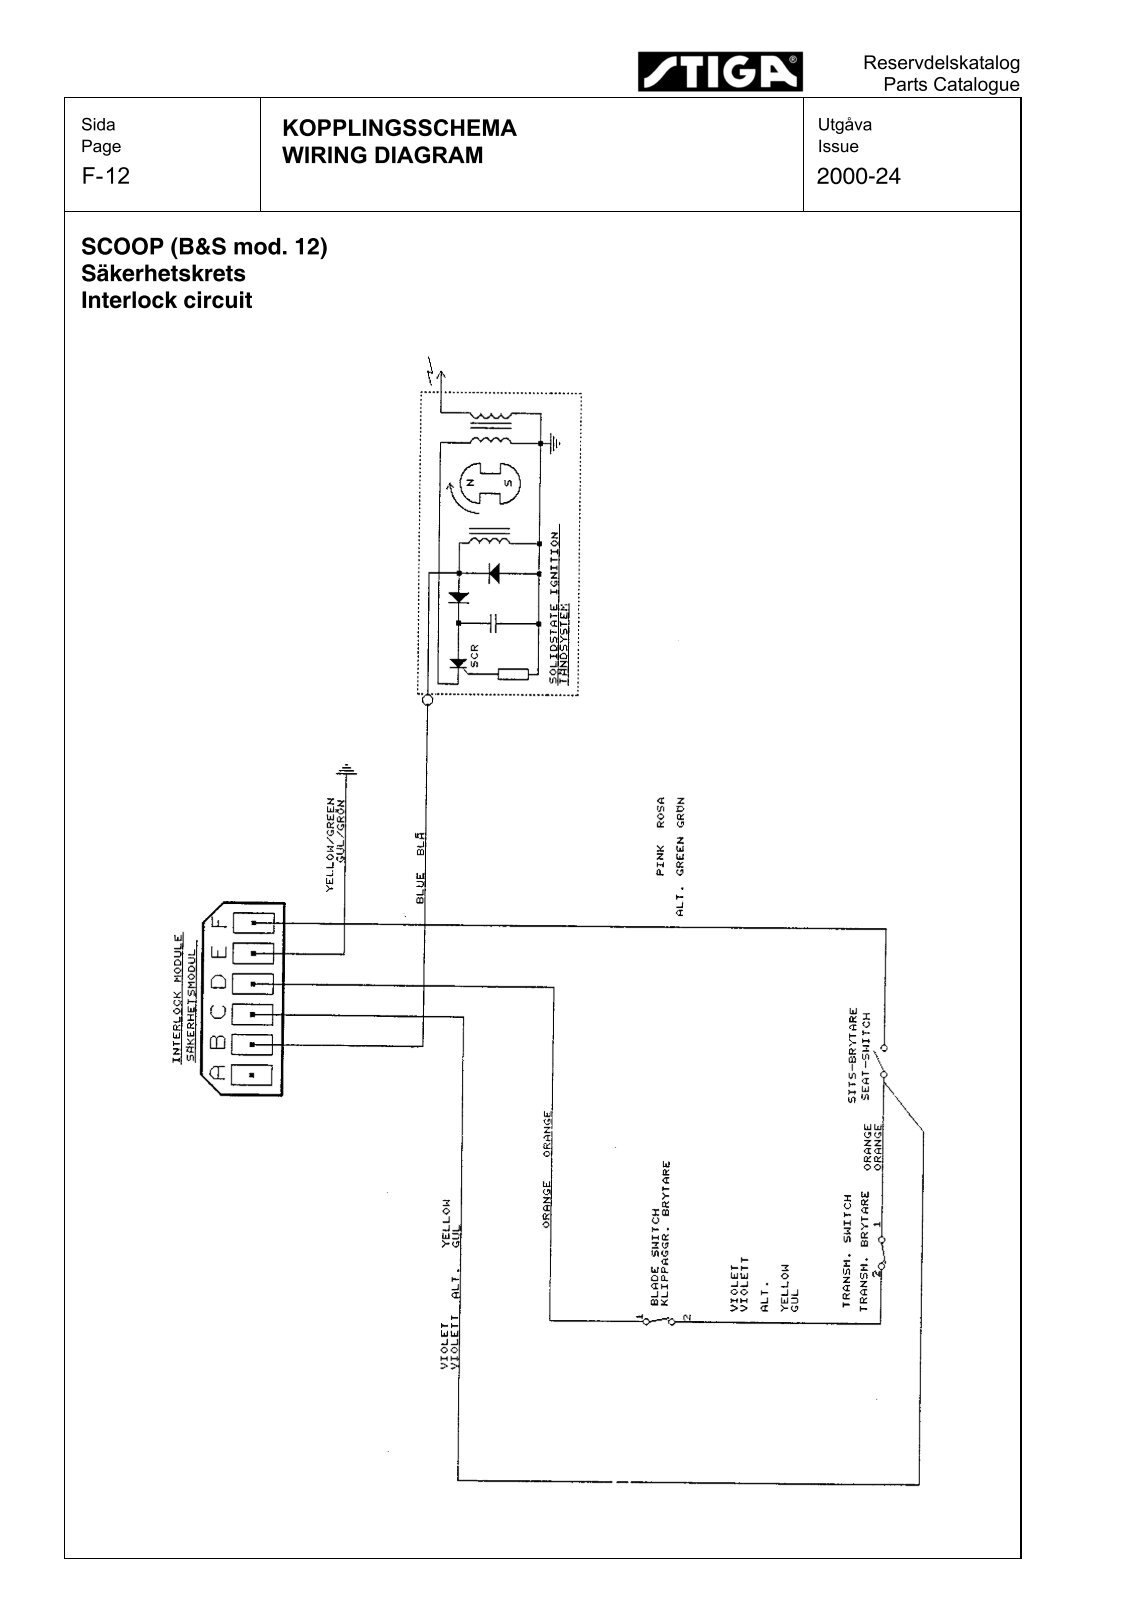 hight resolution of m1008 wiring diagram wiring schematics diagram rh wiring regdiy co cucv m1009 wiring diagram m1008 wiring diagram